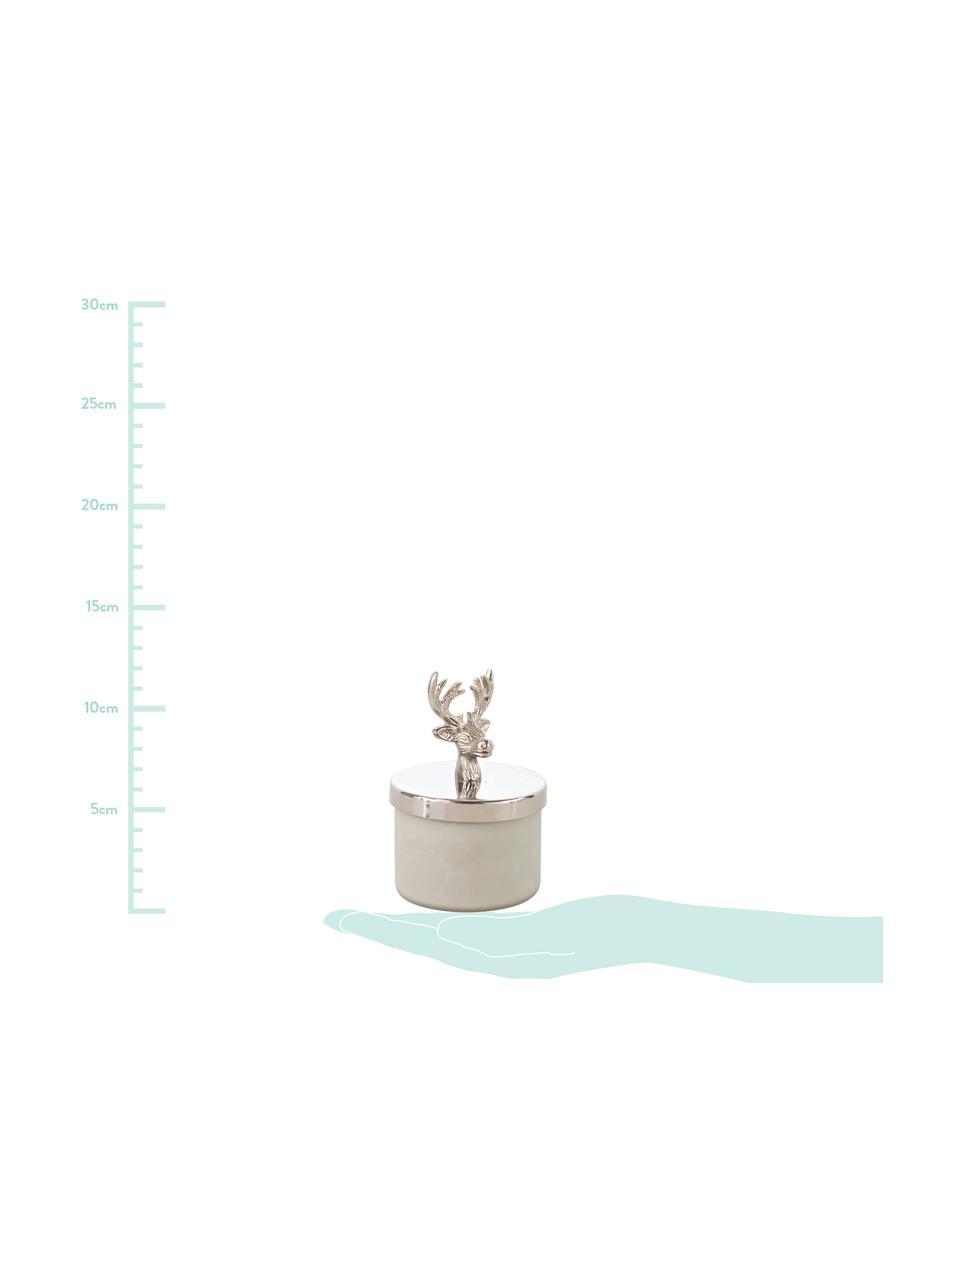 Kerze Deer, Dose: Glas, Deckel: Aluminium, Weiß, Silberfarben, Ø 7 x H 12 cm